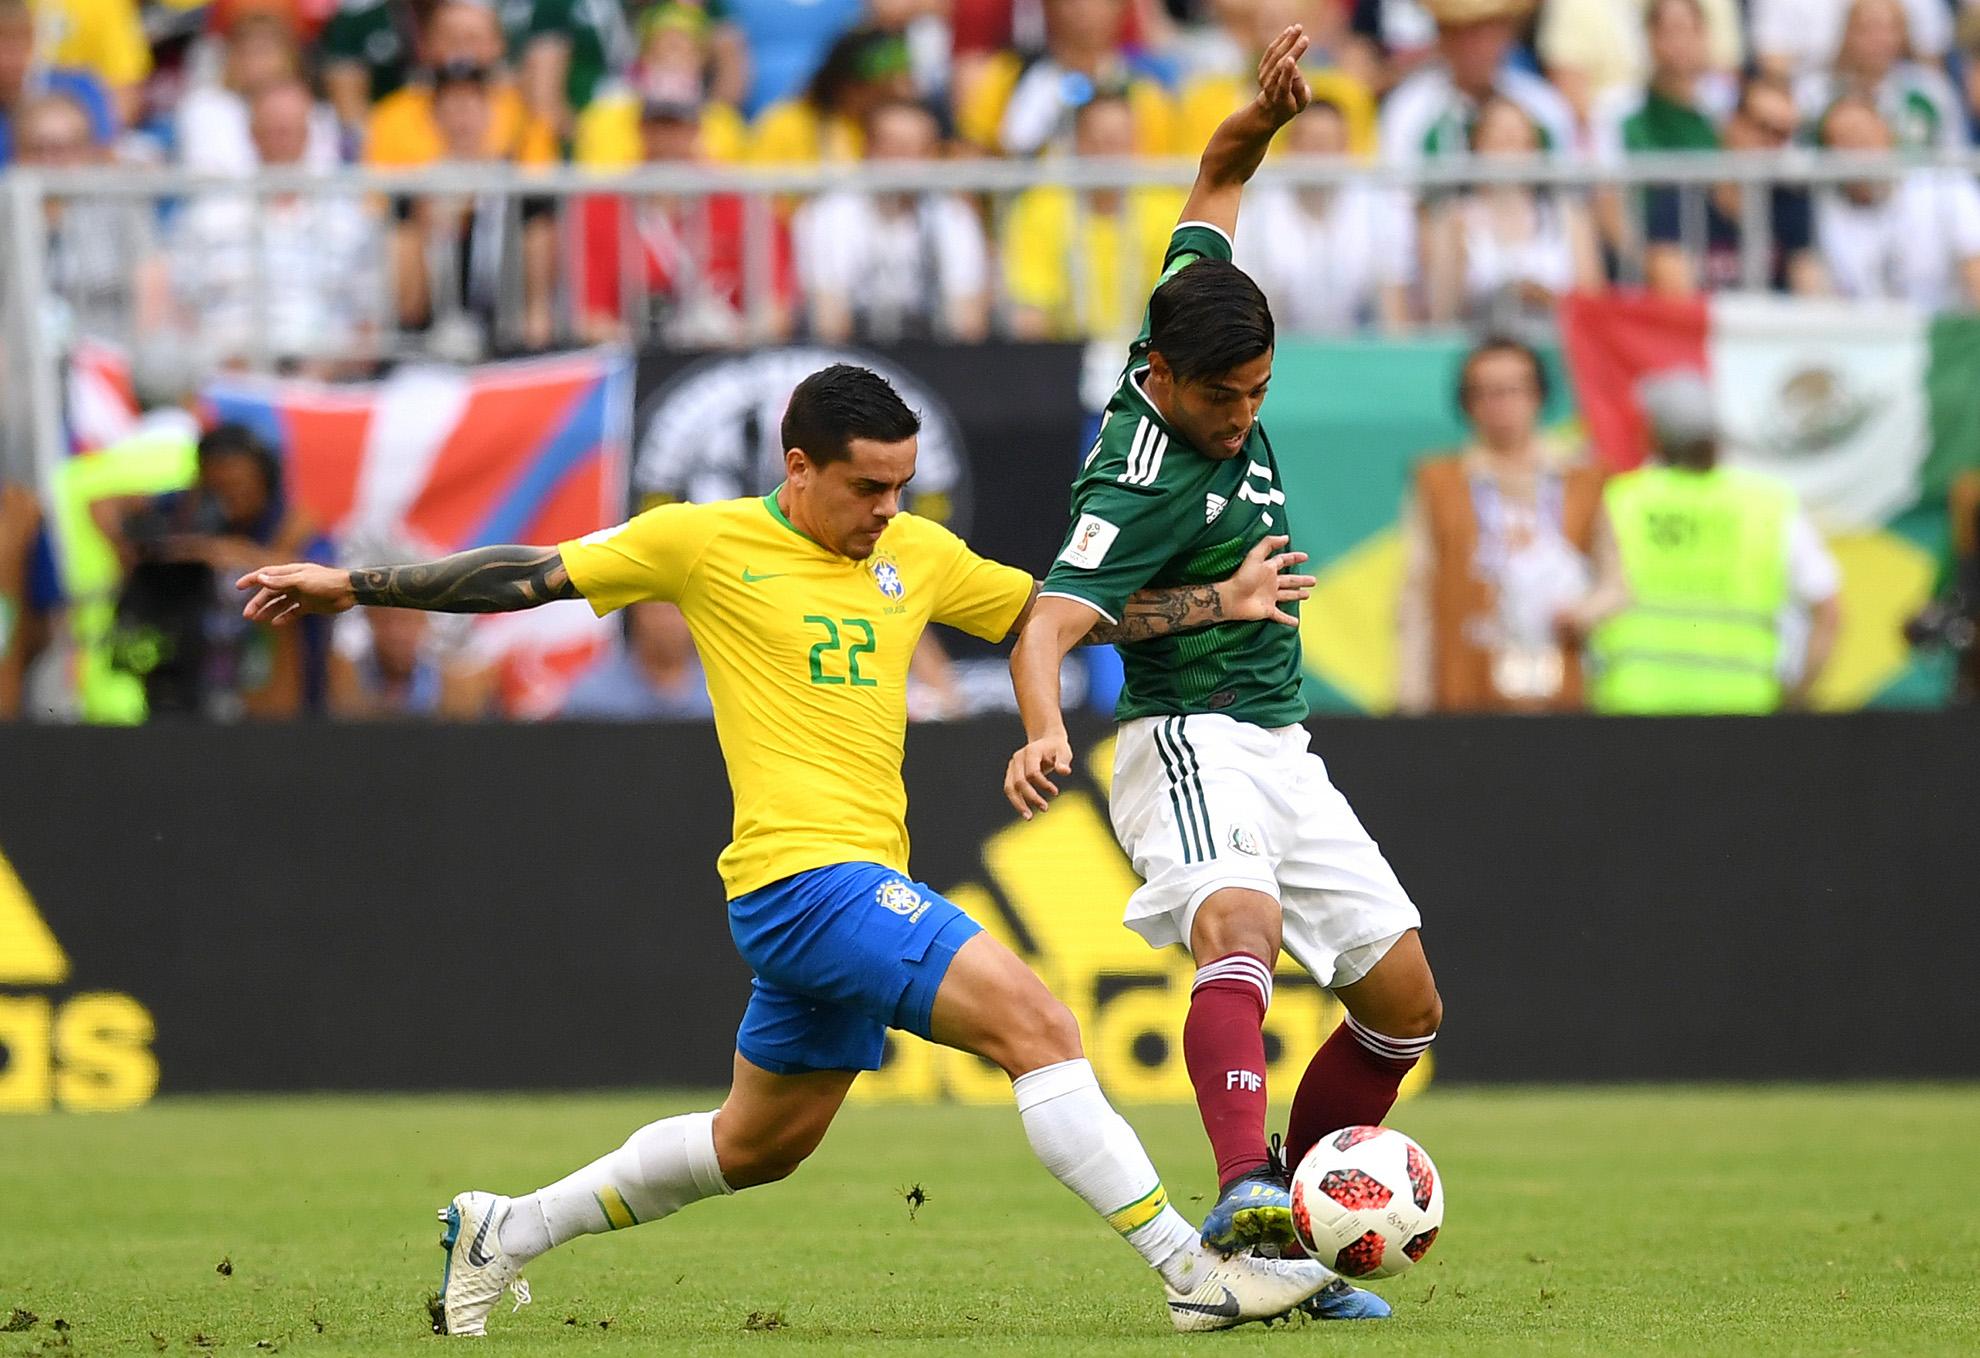 Resultado de imagen para seleccion mexicana rusia 2018